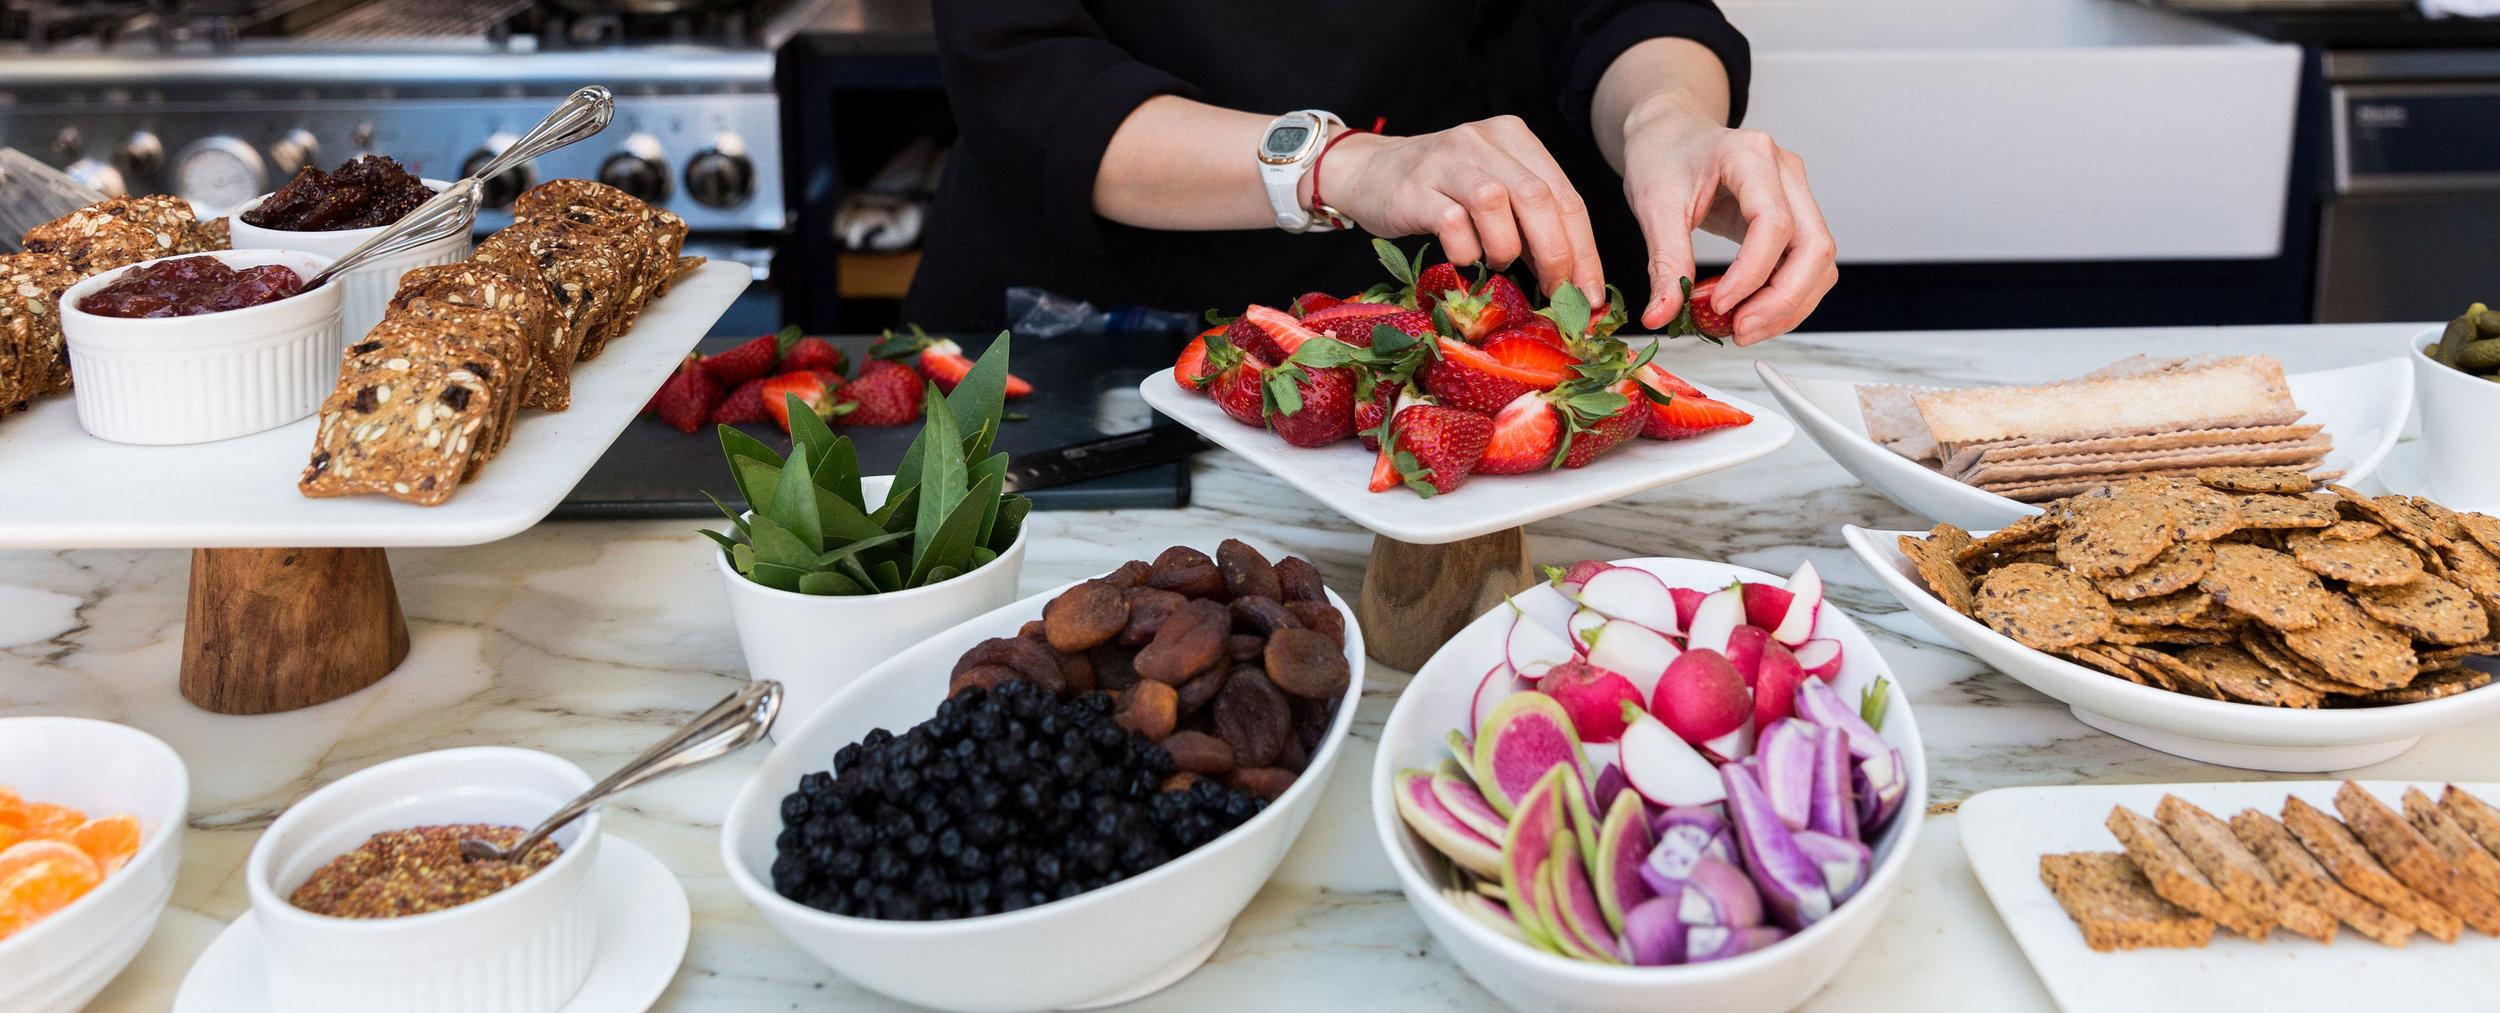 LeighNilePhotography-CaliforniaStrawberries-121.jpg